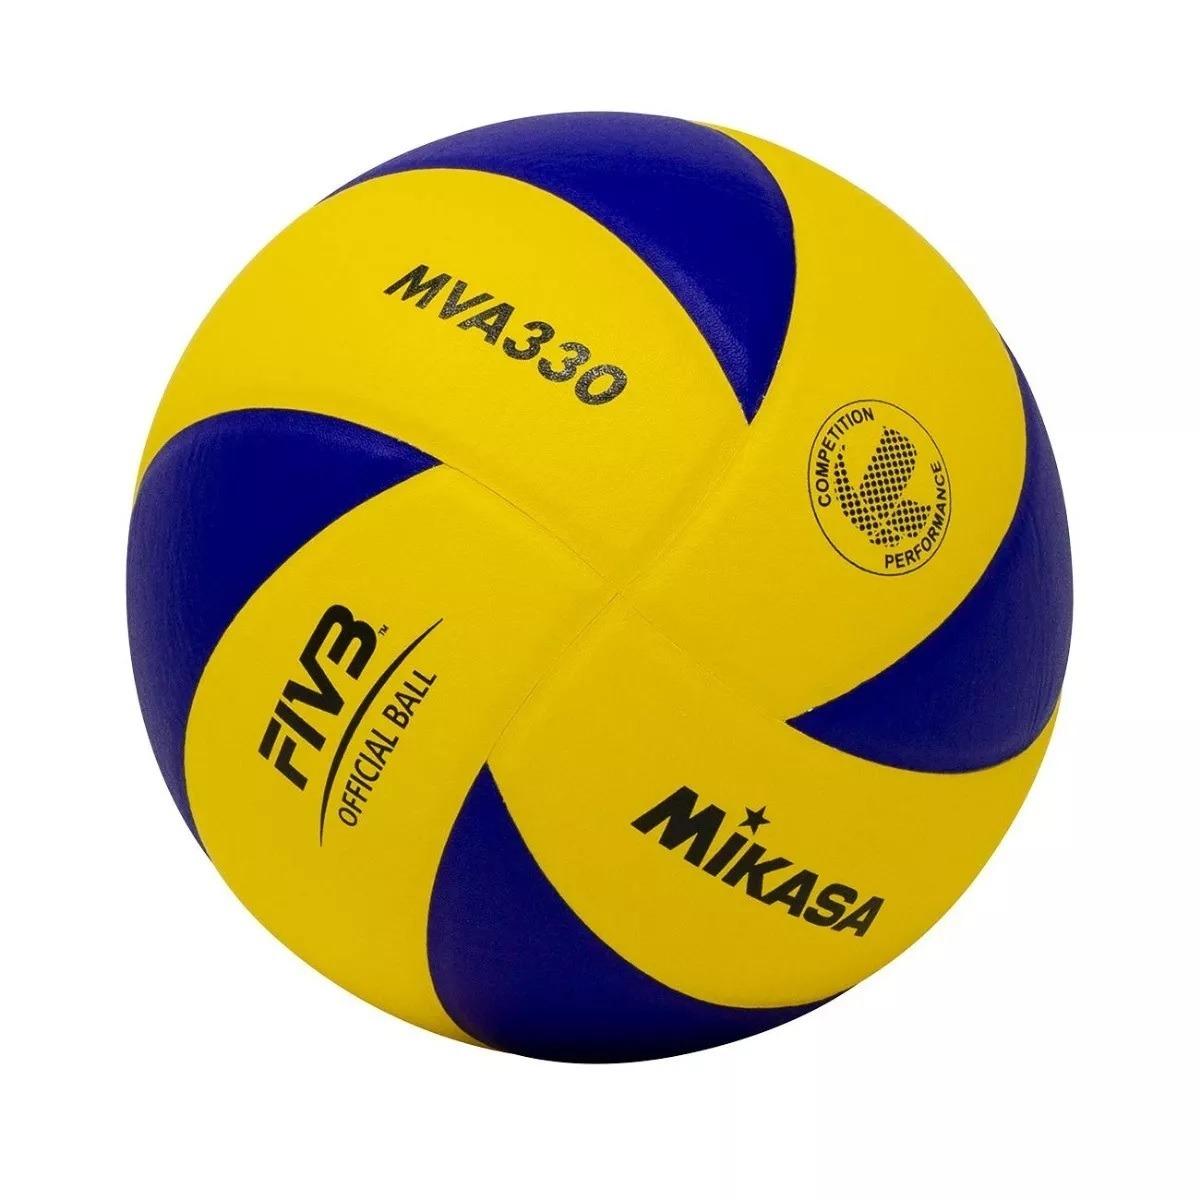 b6eb7b8019512 pelota de voley mva330 mikasa oficial fivb volley sellada. Cargando zoom.